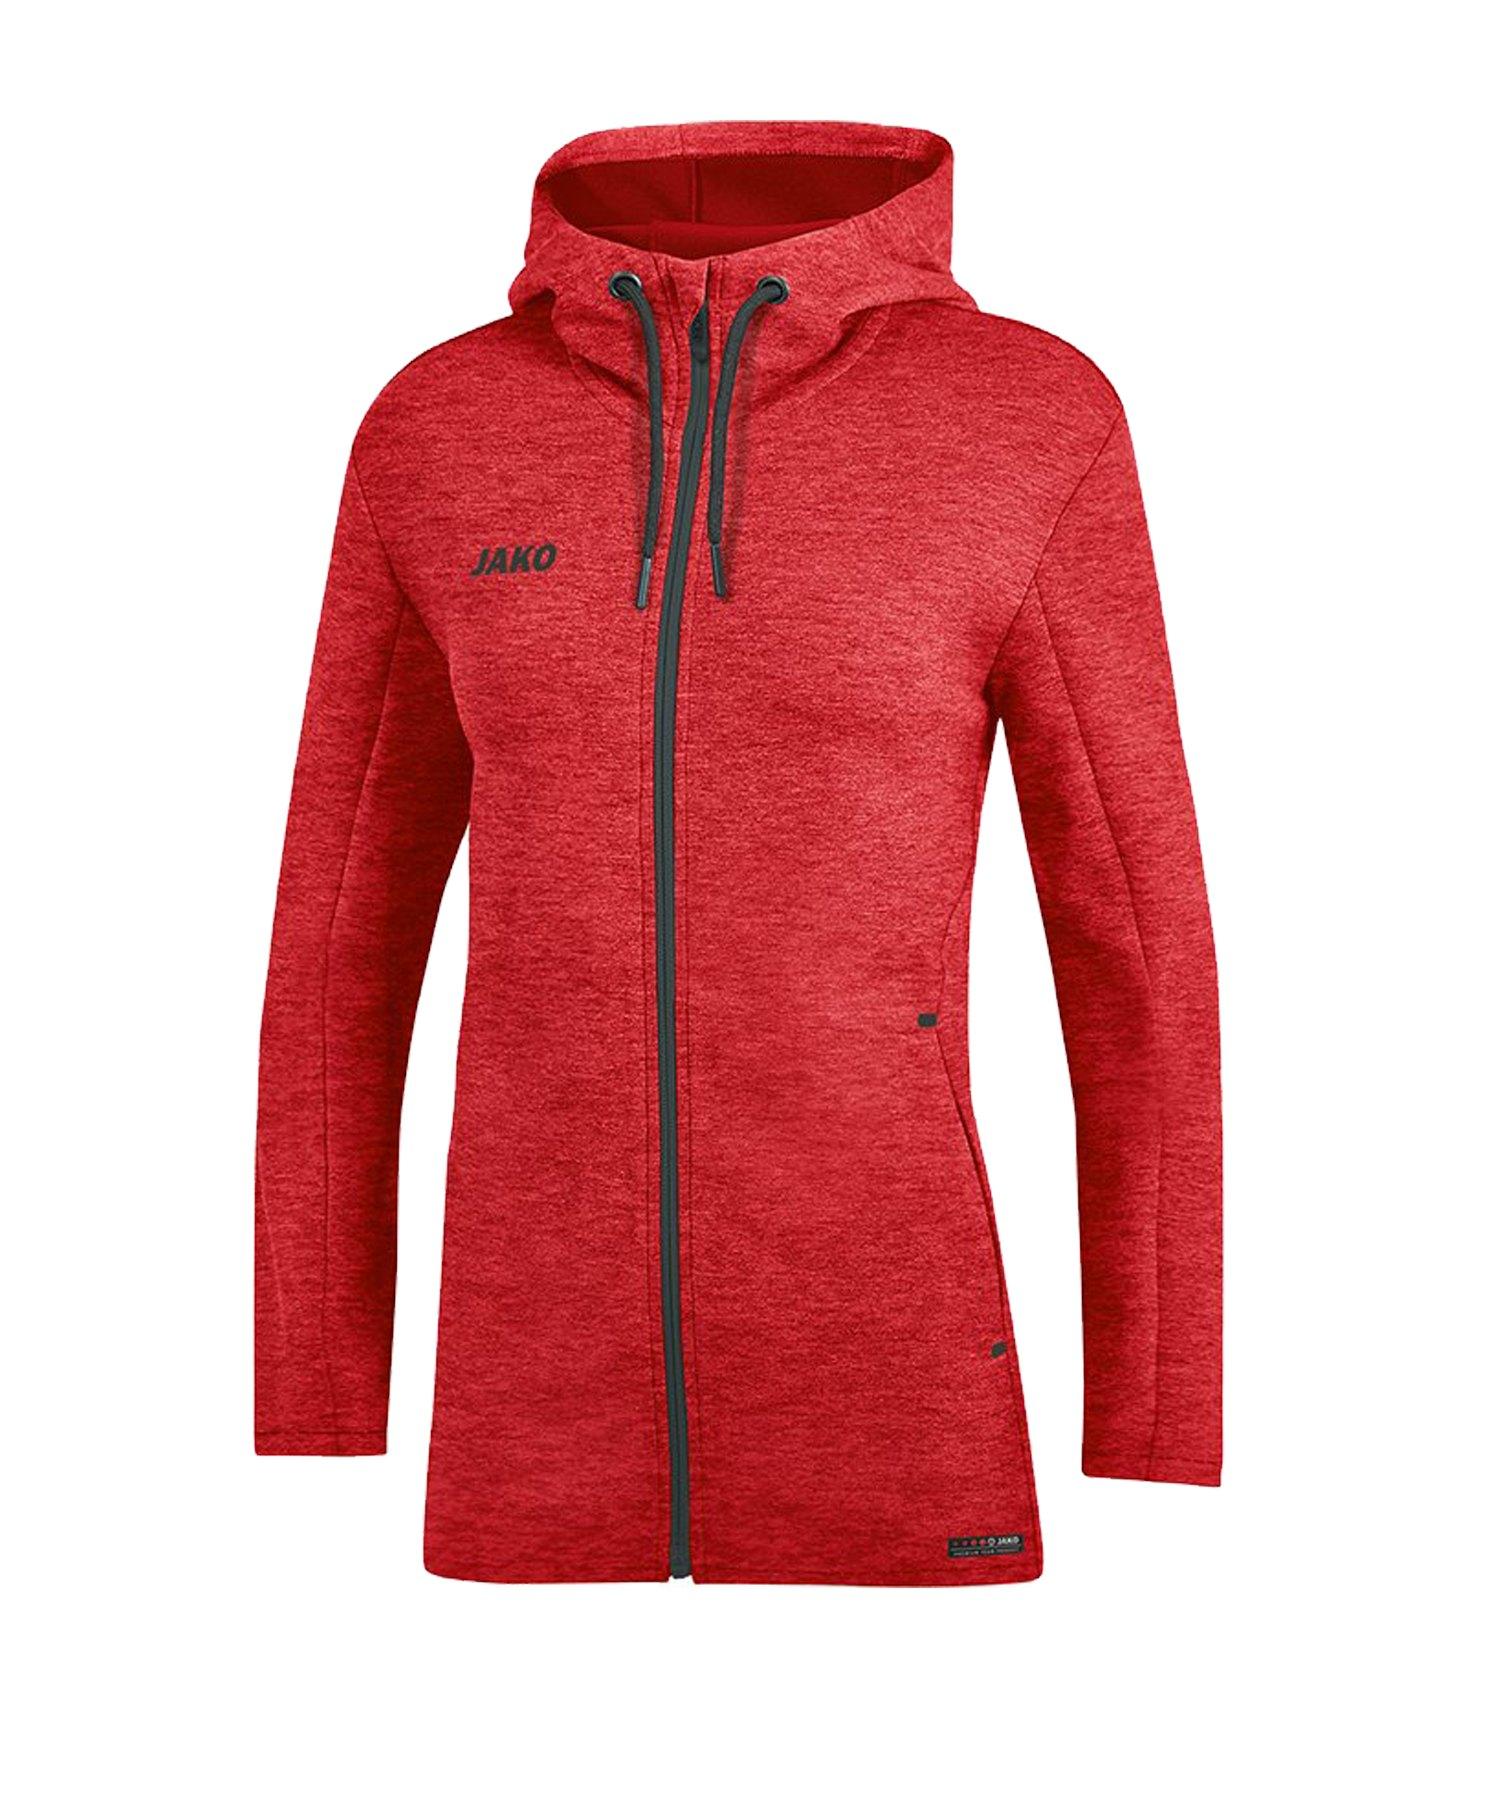 Jako Premium Basic Kapuzenjacke Damen Rot F01 - rot